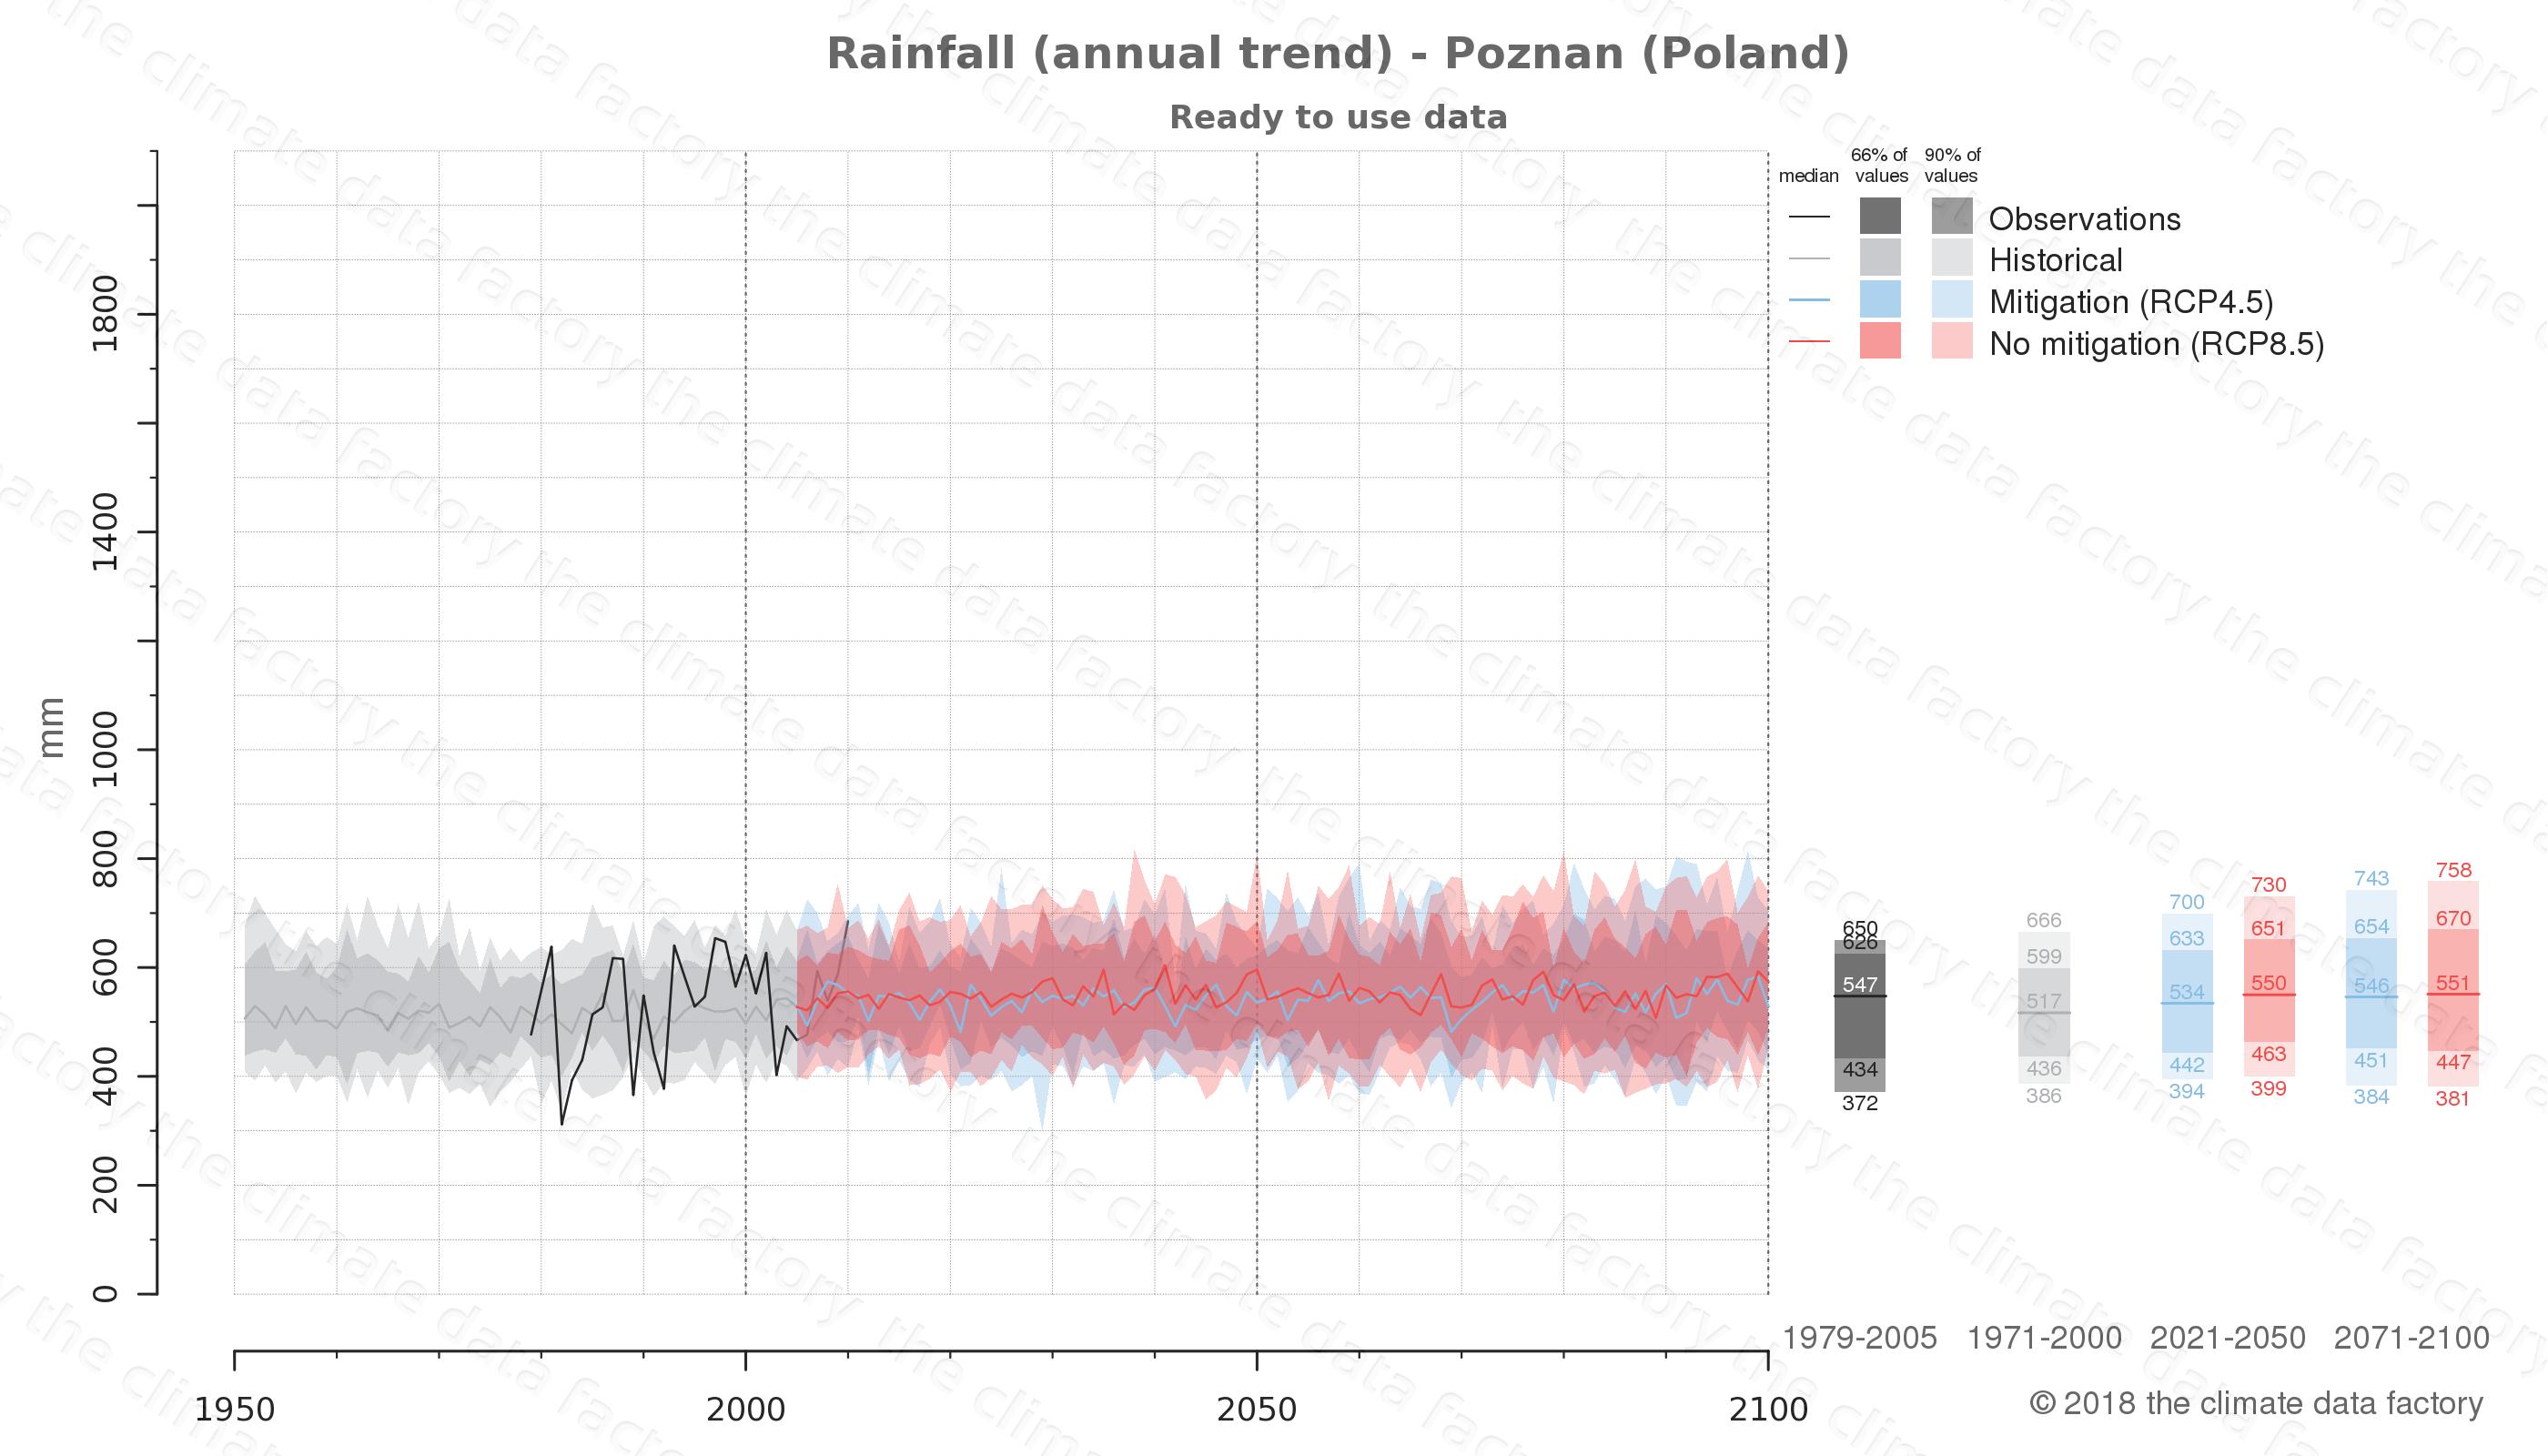 climate change data policy adaptation climate graph city data rainfall poznan poland